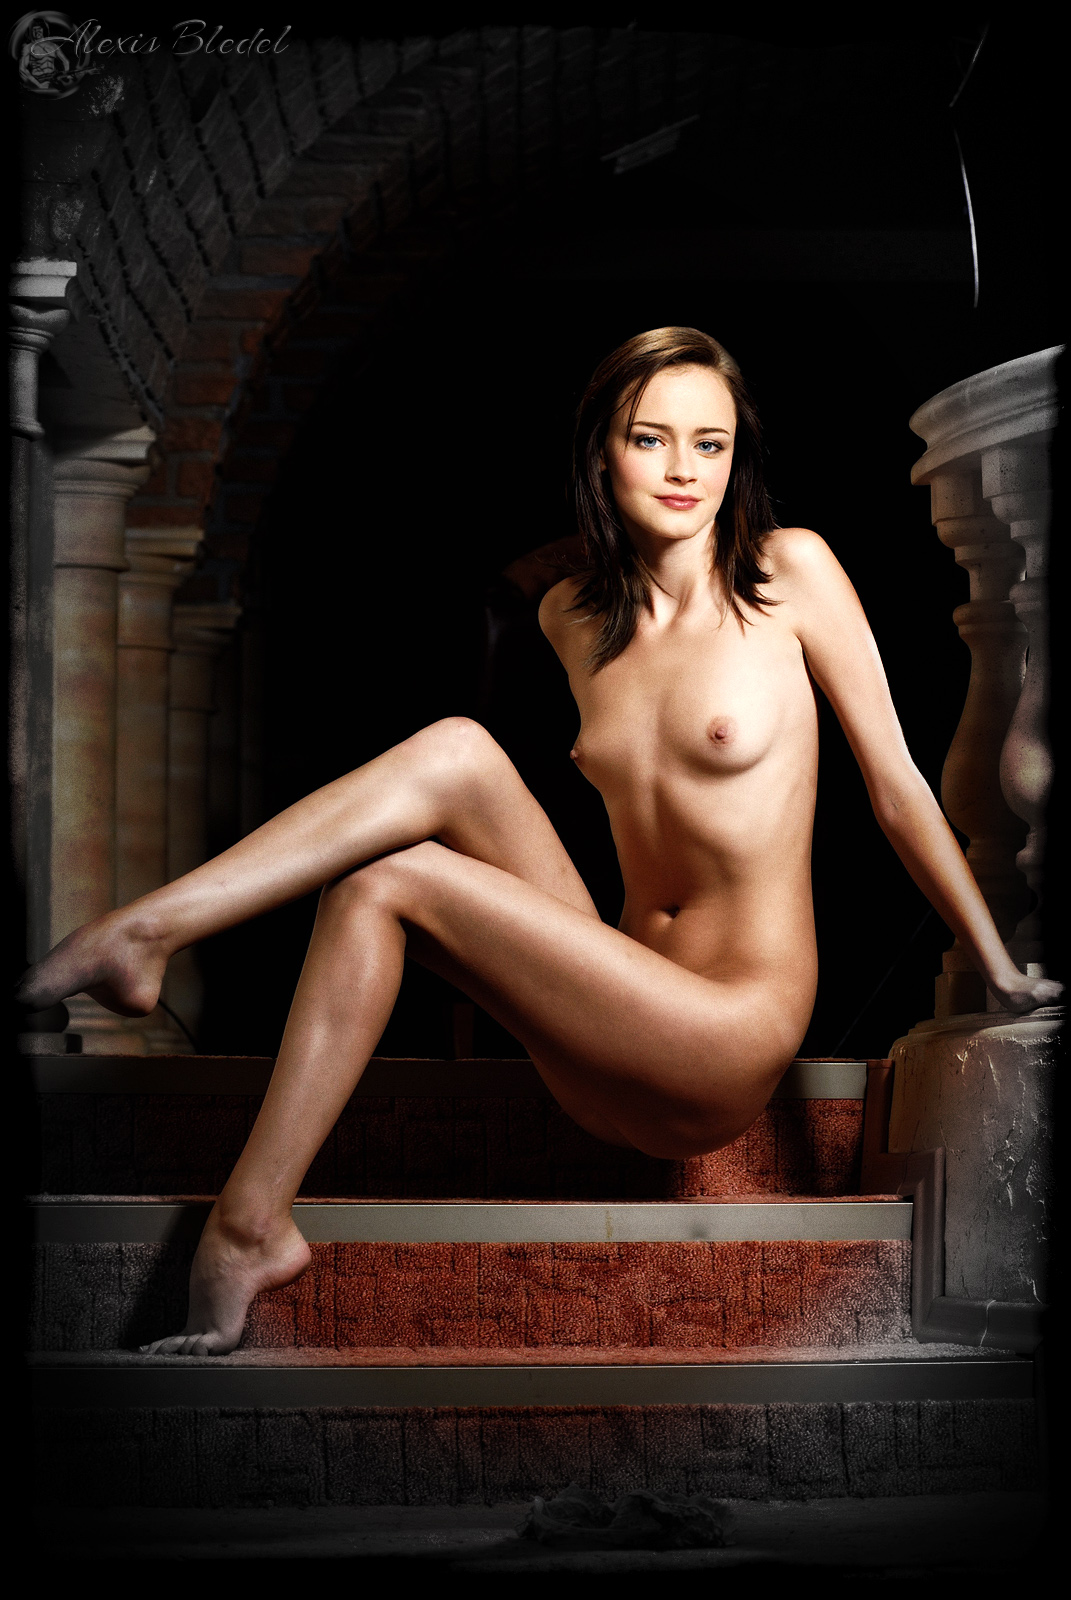 alexis bledel nude